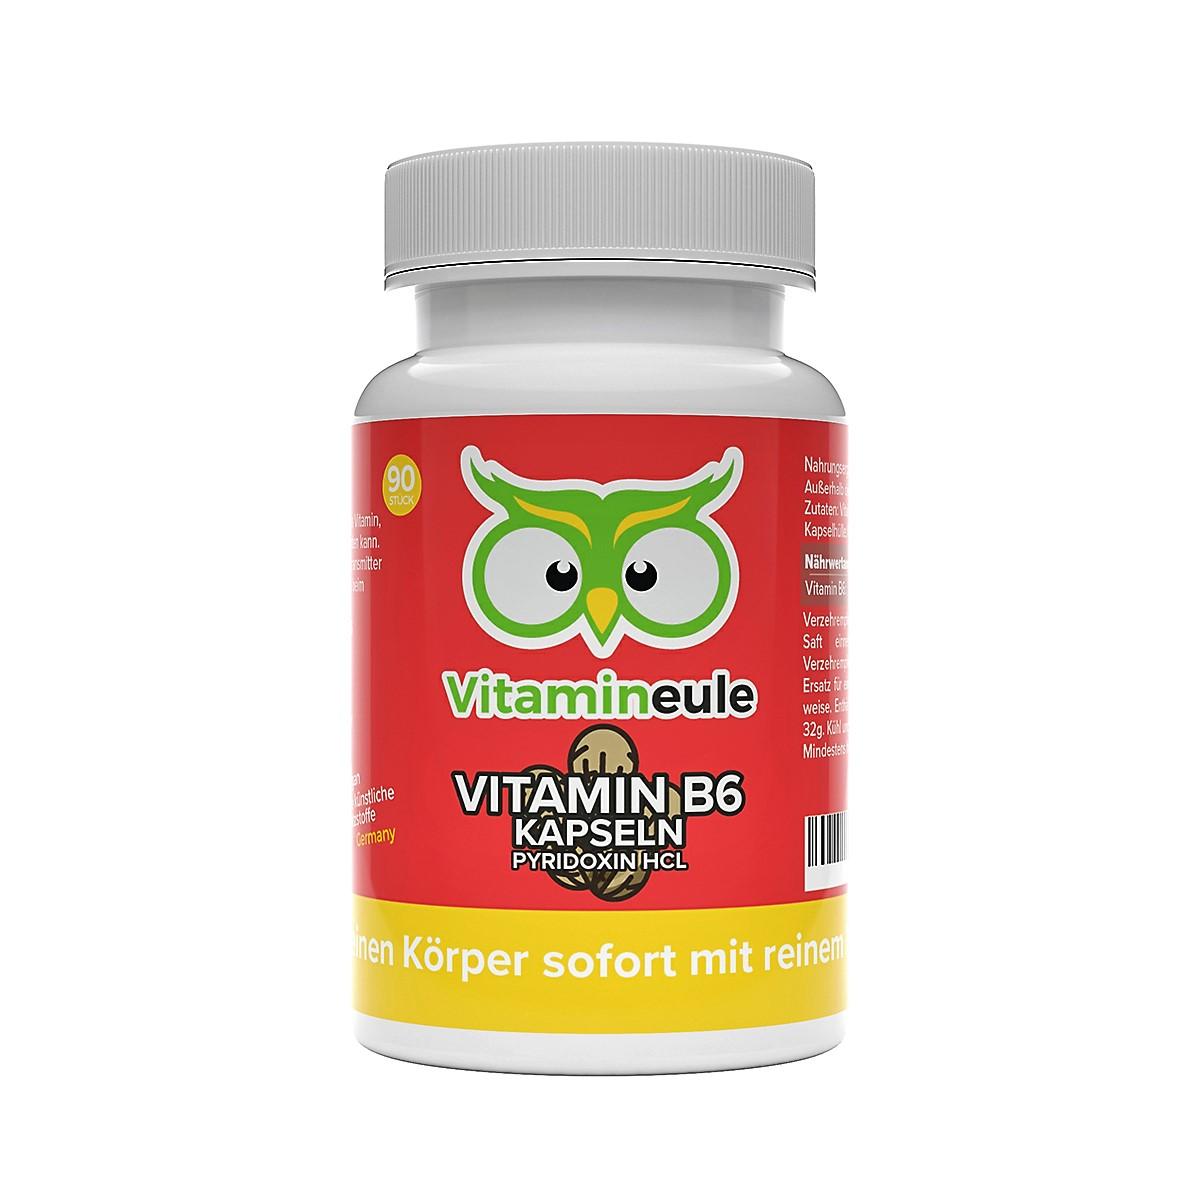 Vitamin B6 Kapseln von Vitamineule